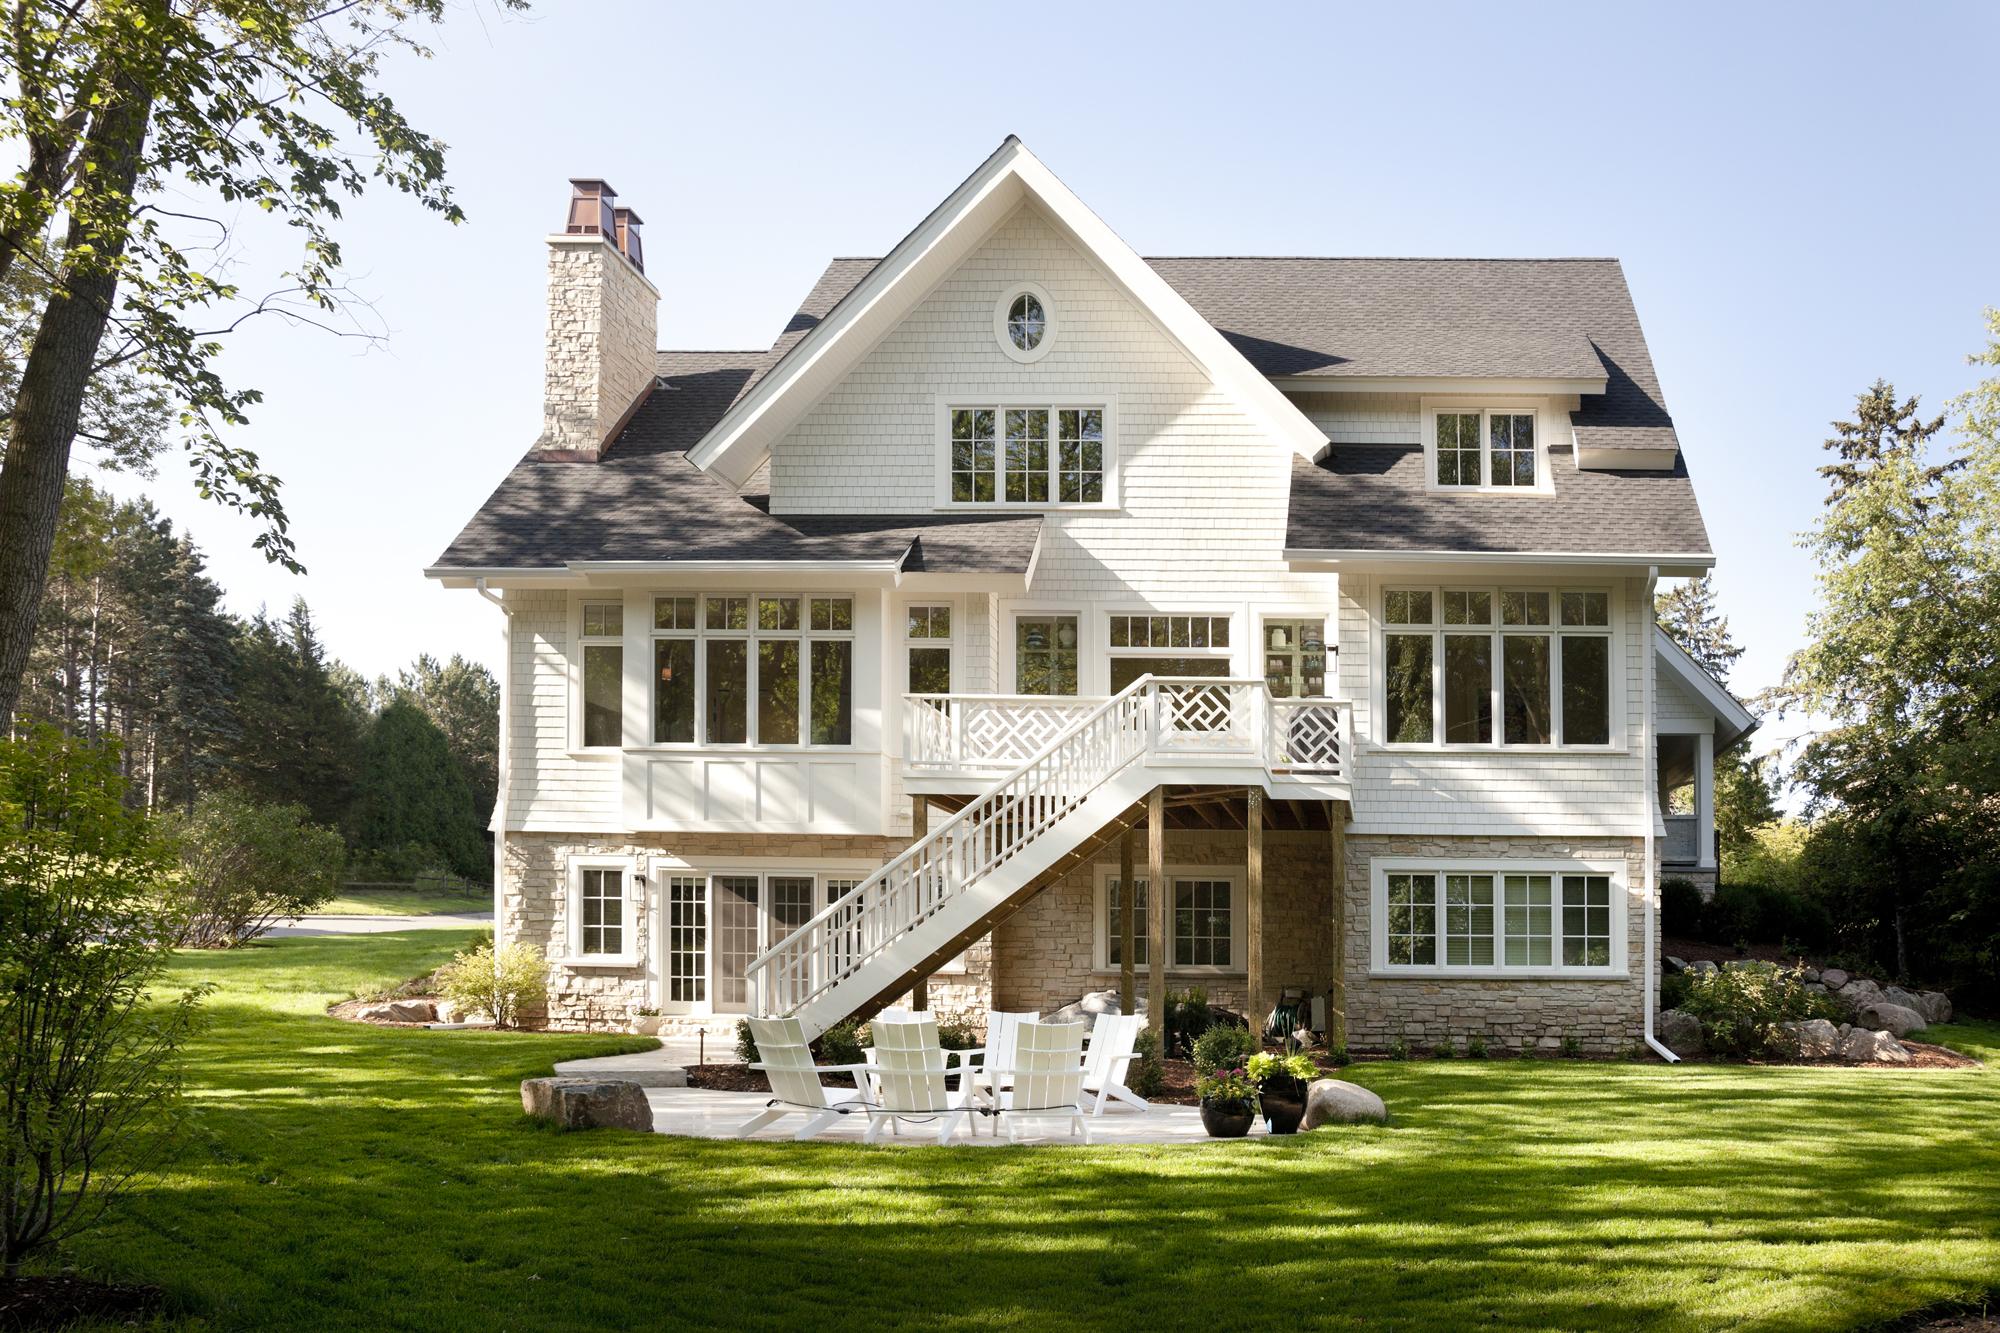 RLH Home EXTERIOR5.jpg